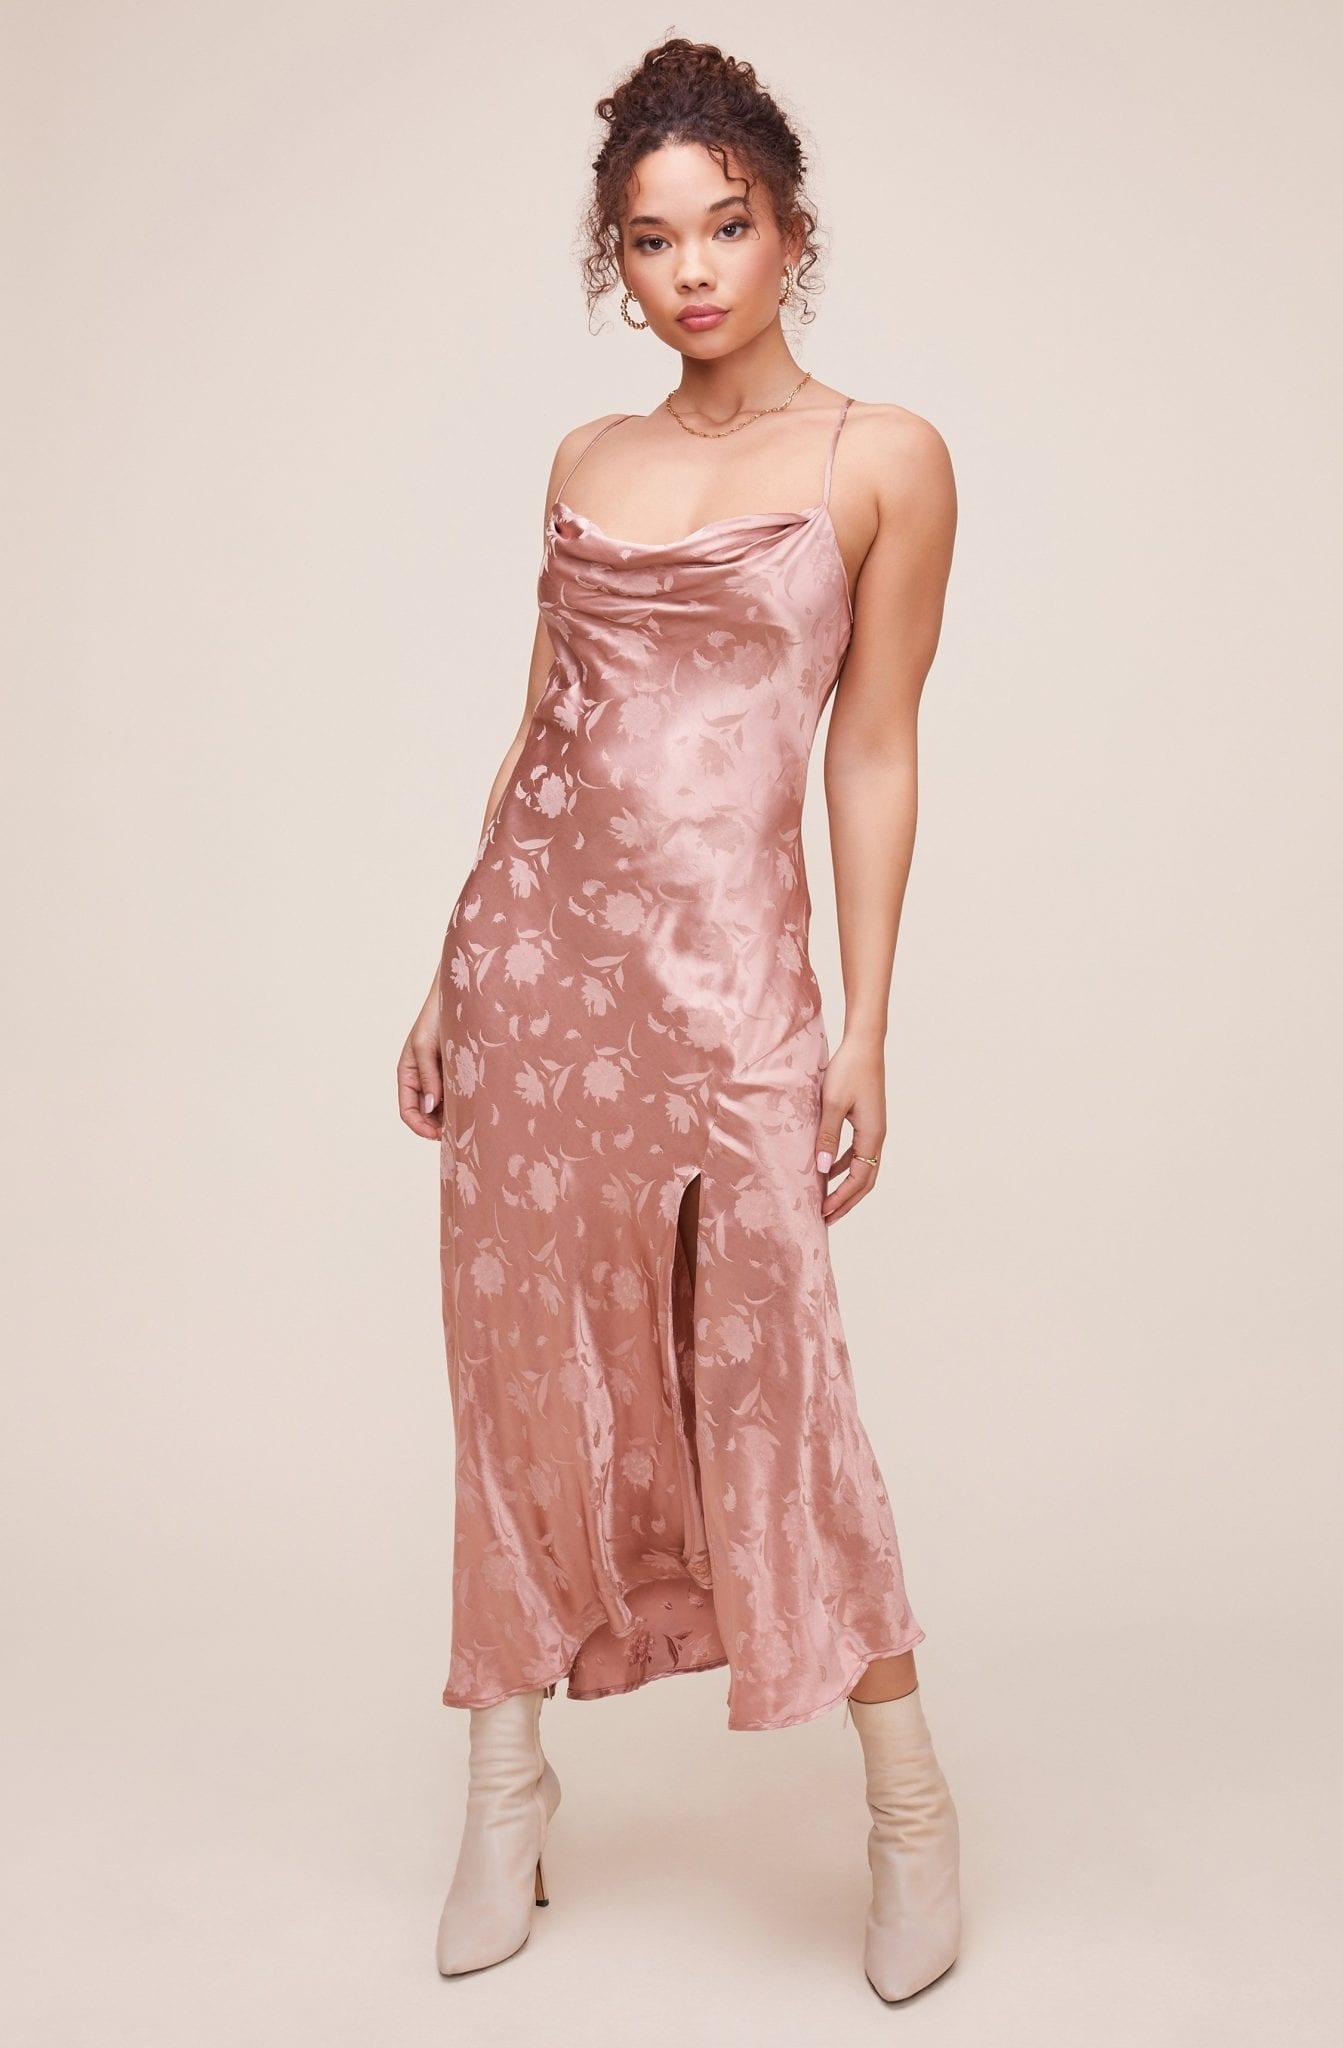 ASTRTHELABEL Gaia Floral Jacquard Midi Dress